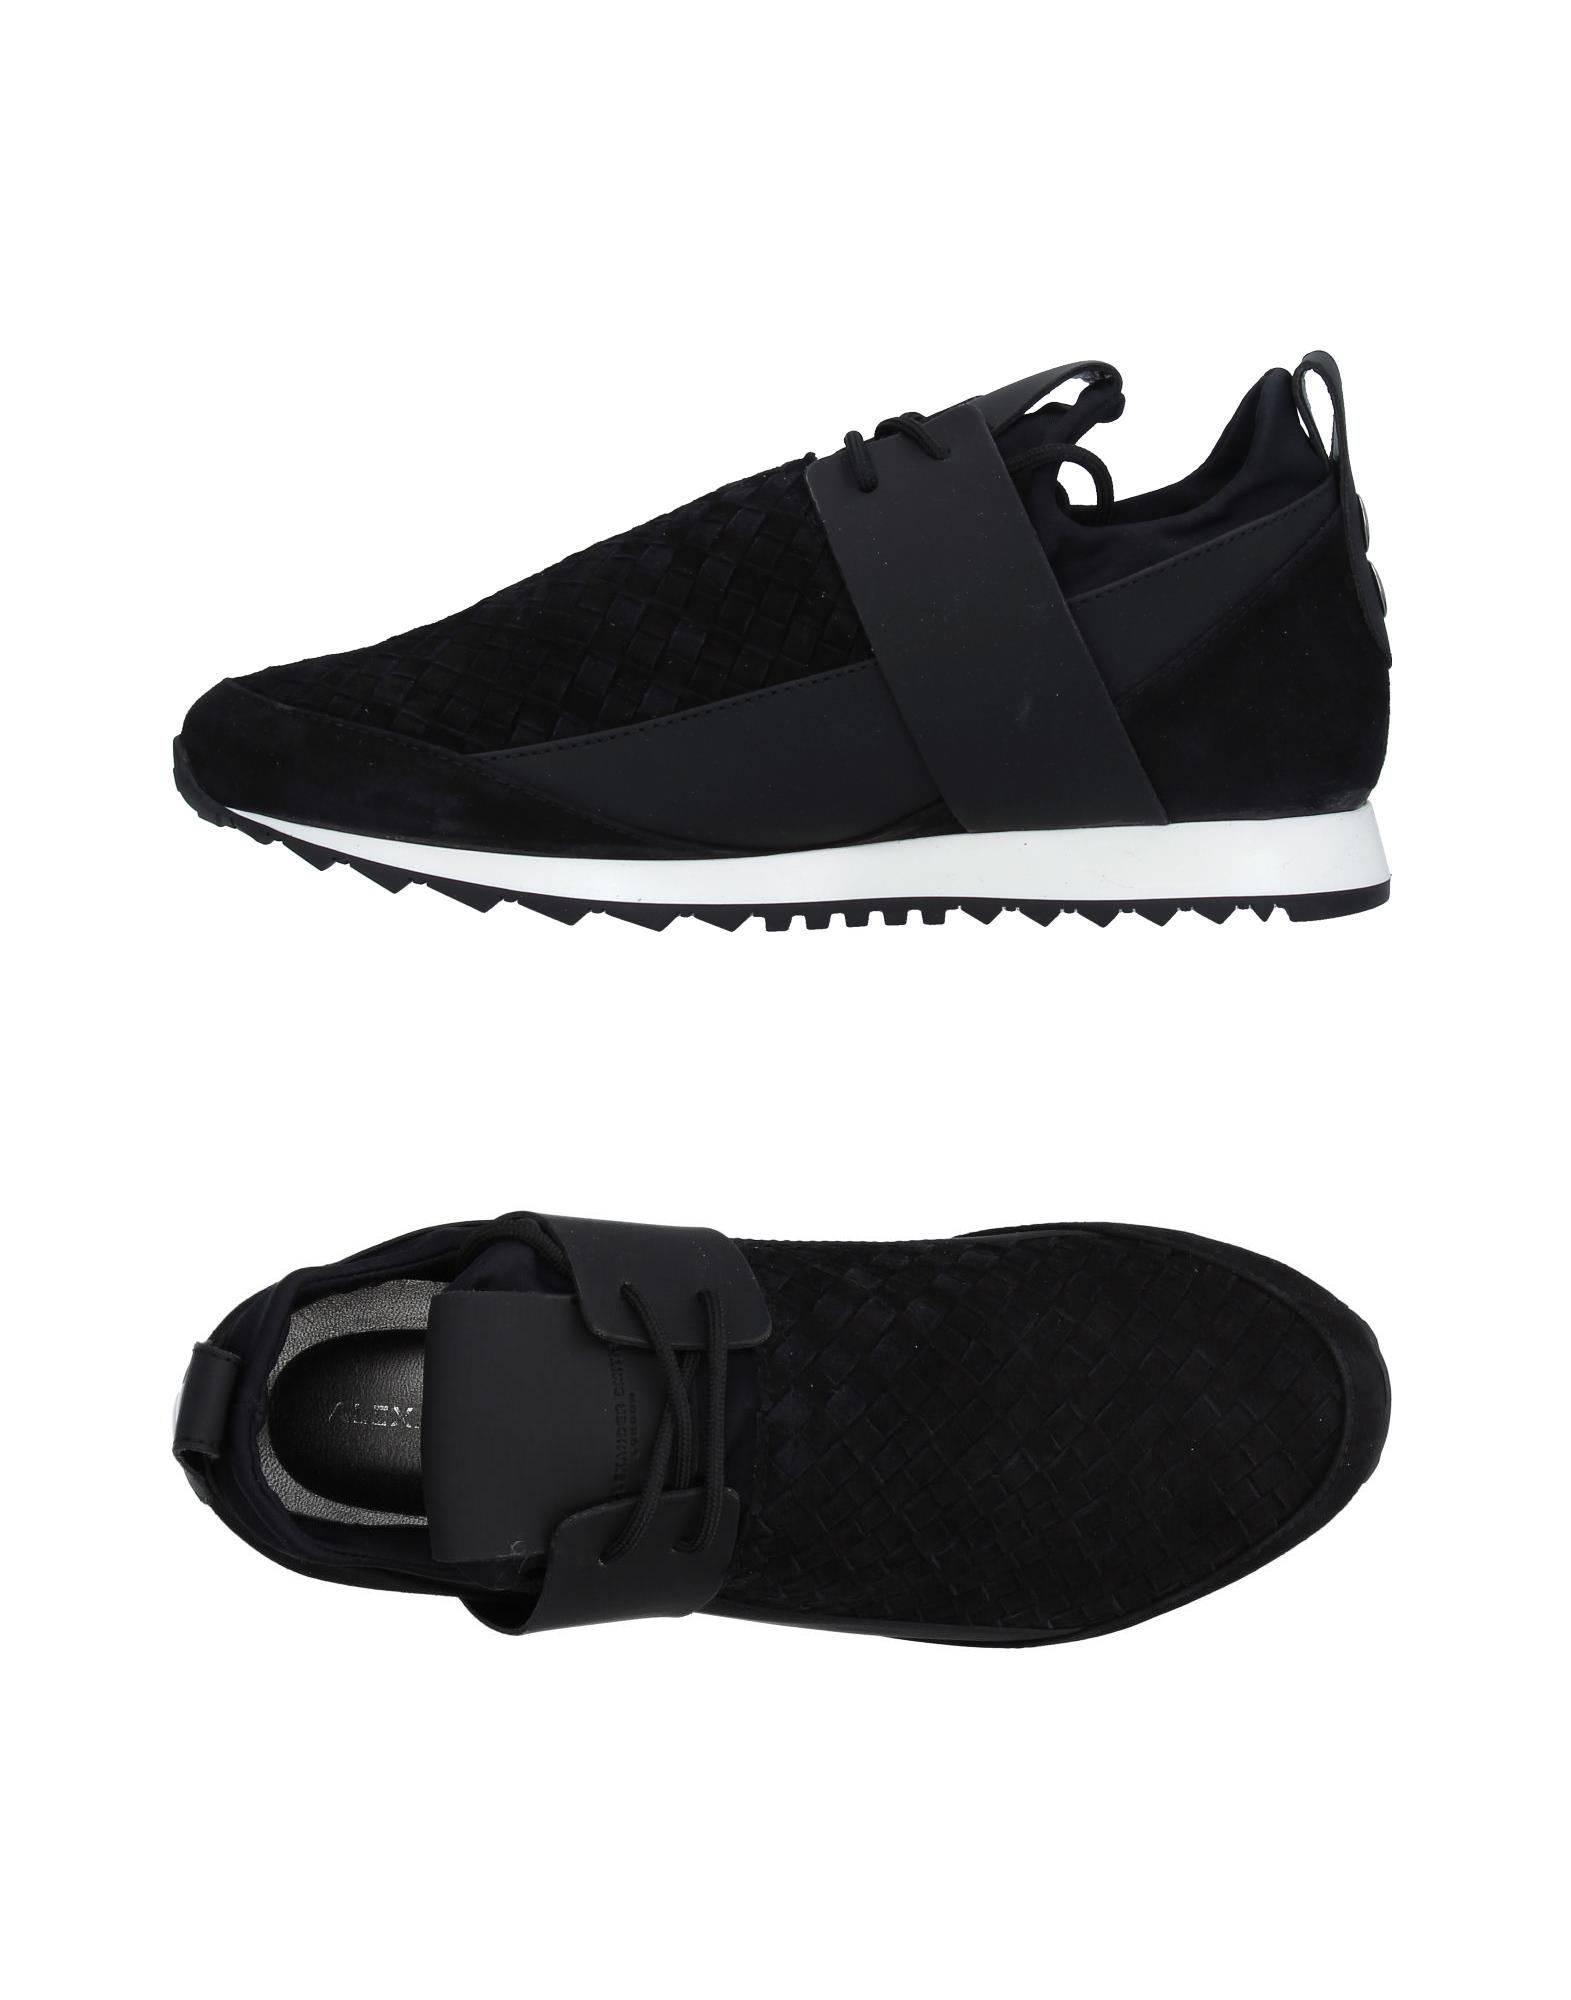 Alexander Smith Sneakers - Men Alexander Smith Canada Sneakers online on  Canada Smith - 11234047GR fbe3b3